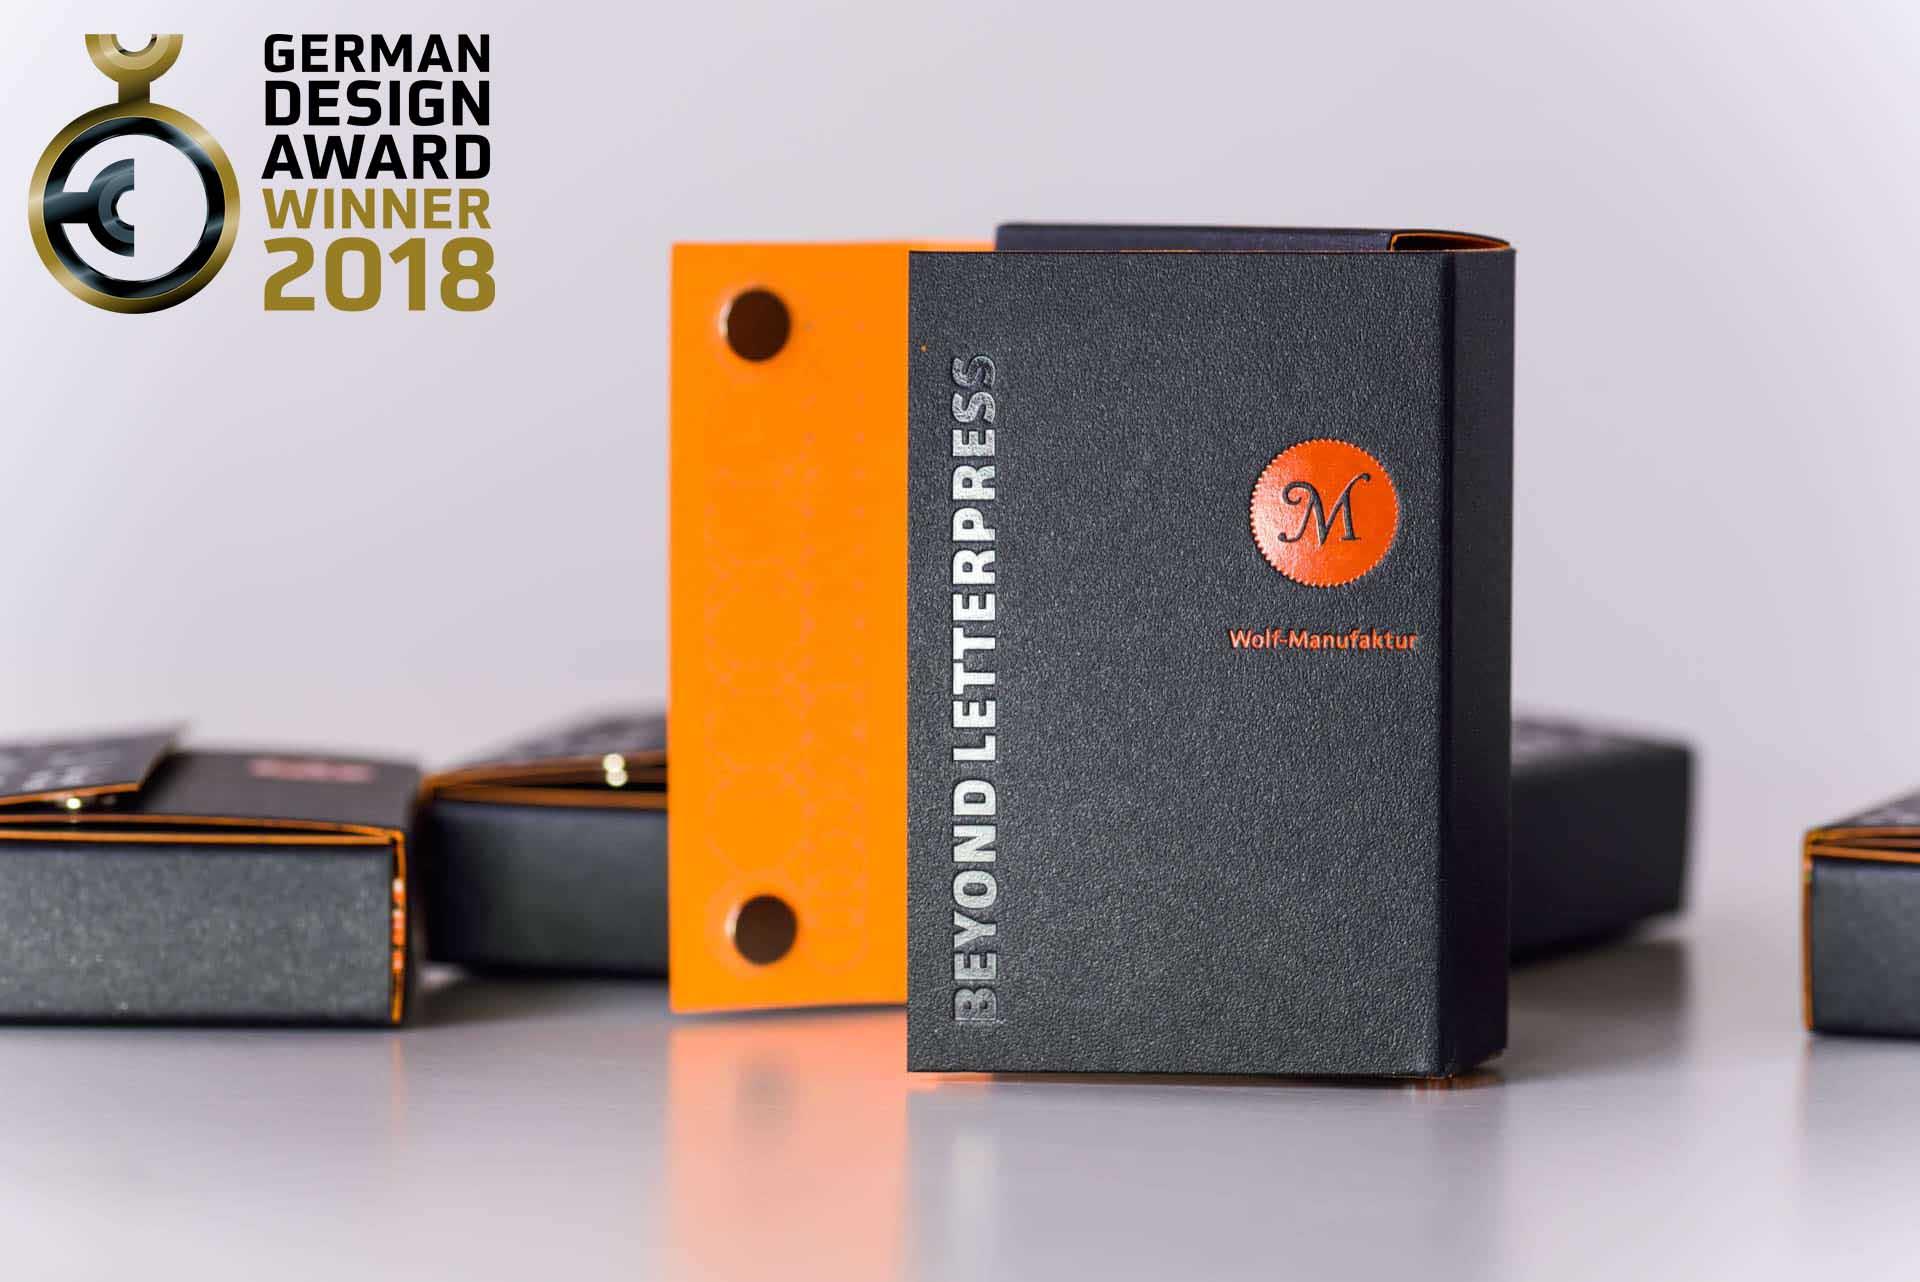 Wolf Manufaktur Ist German Design Award 2018 Winner